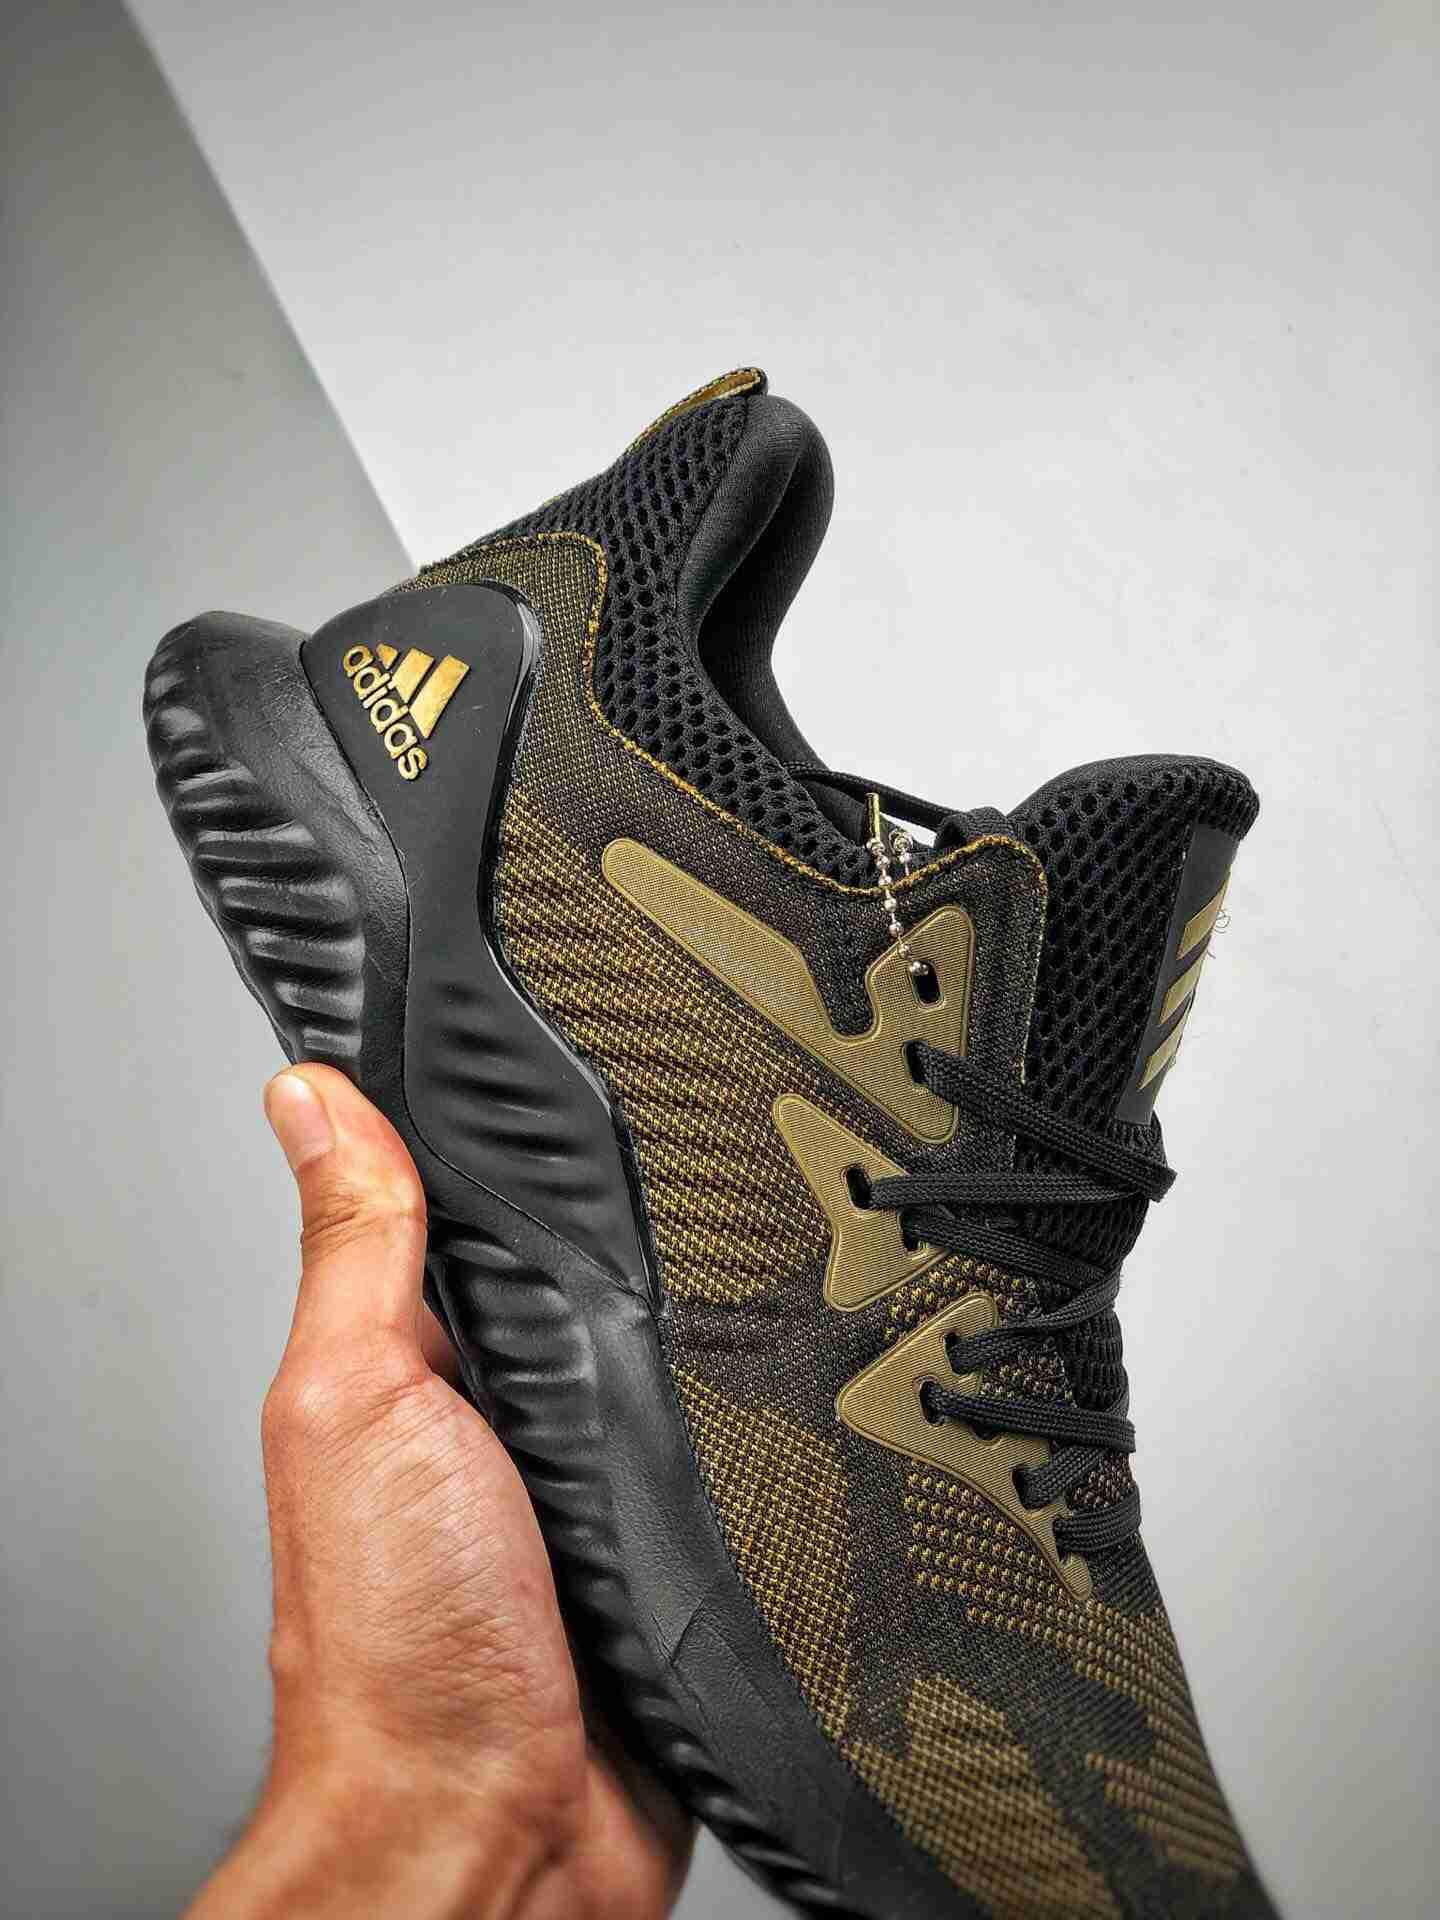 Adidas AlphaBounce HPC AMS 3M反光 阿尔法三代 黑金